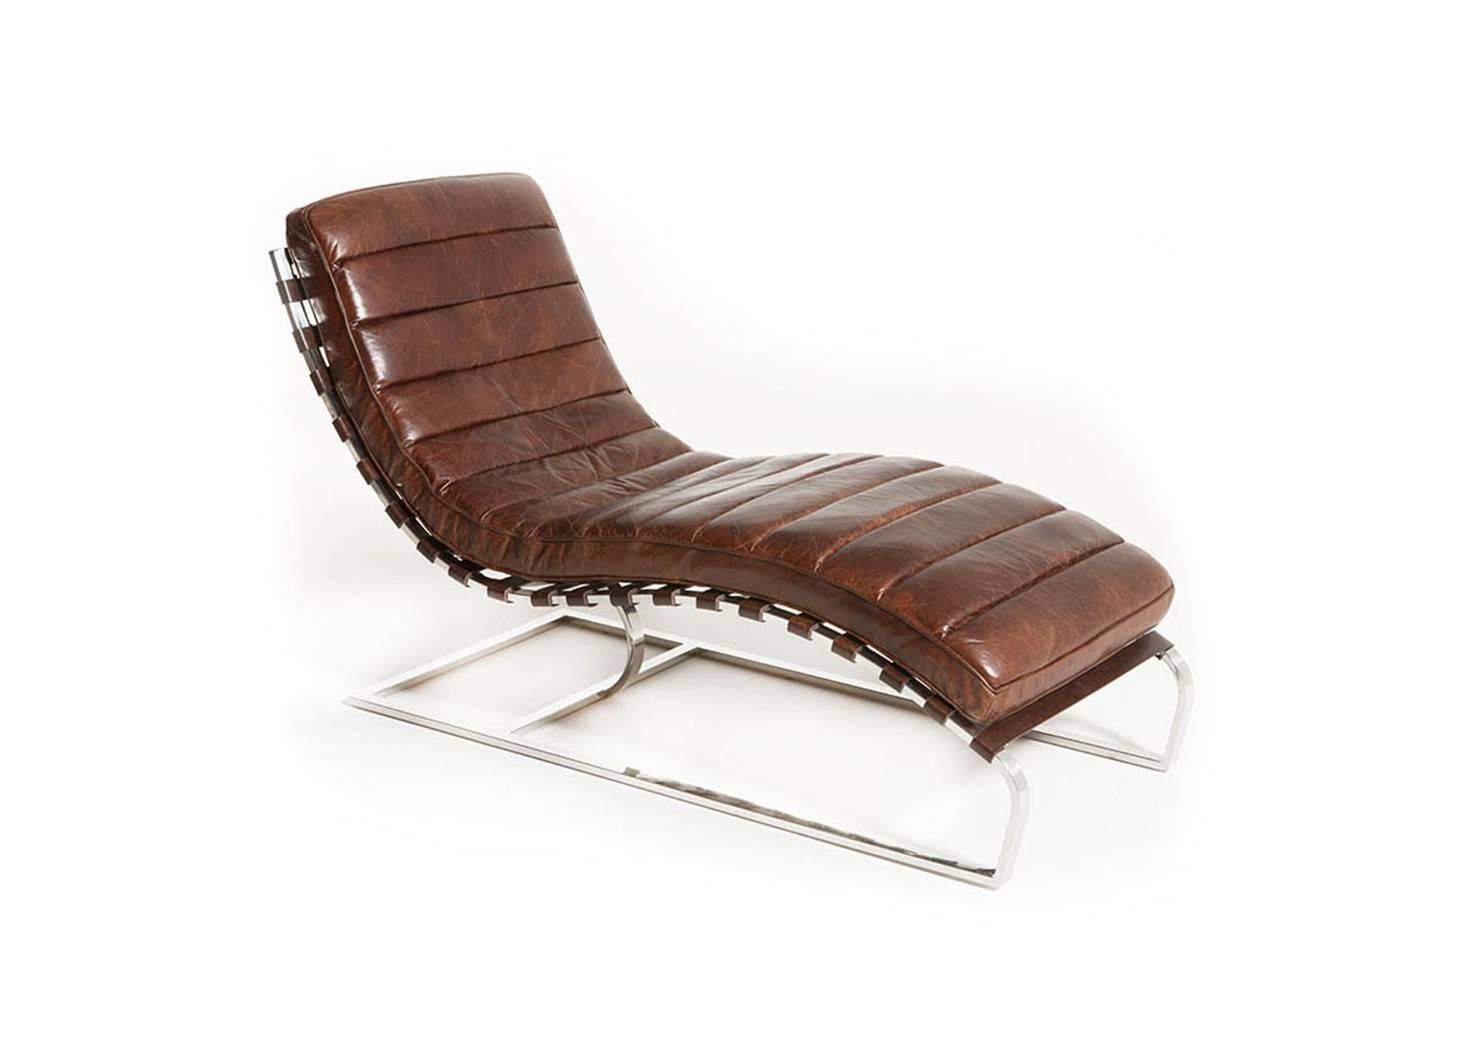 Chaise Longue M 233 Ridienne Lounge Cuir Marron Cigare